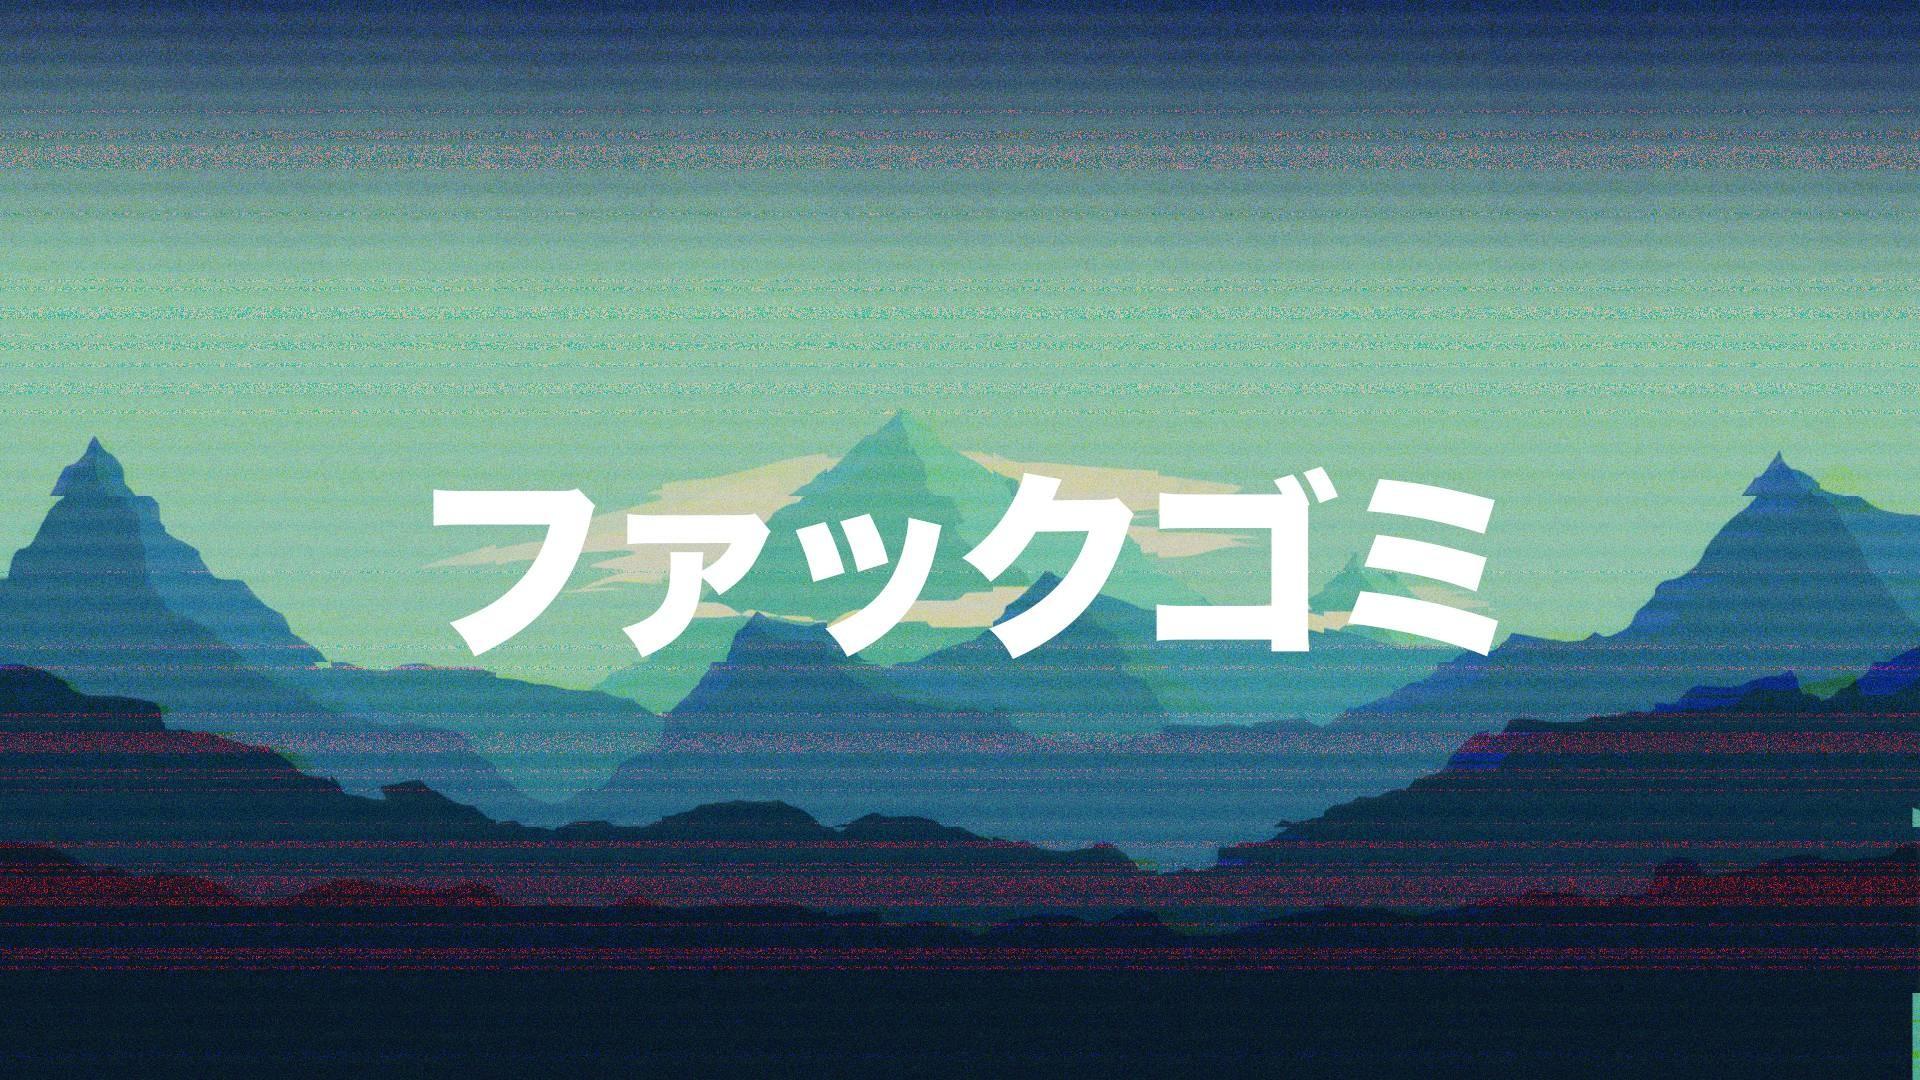 Glitch mountains with Kanji [1920×1080]